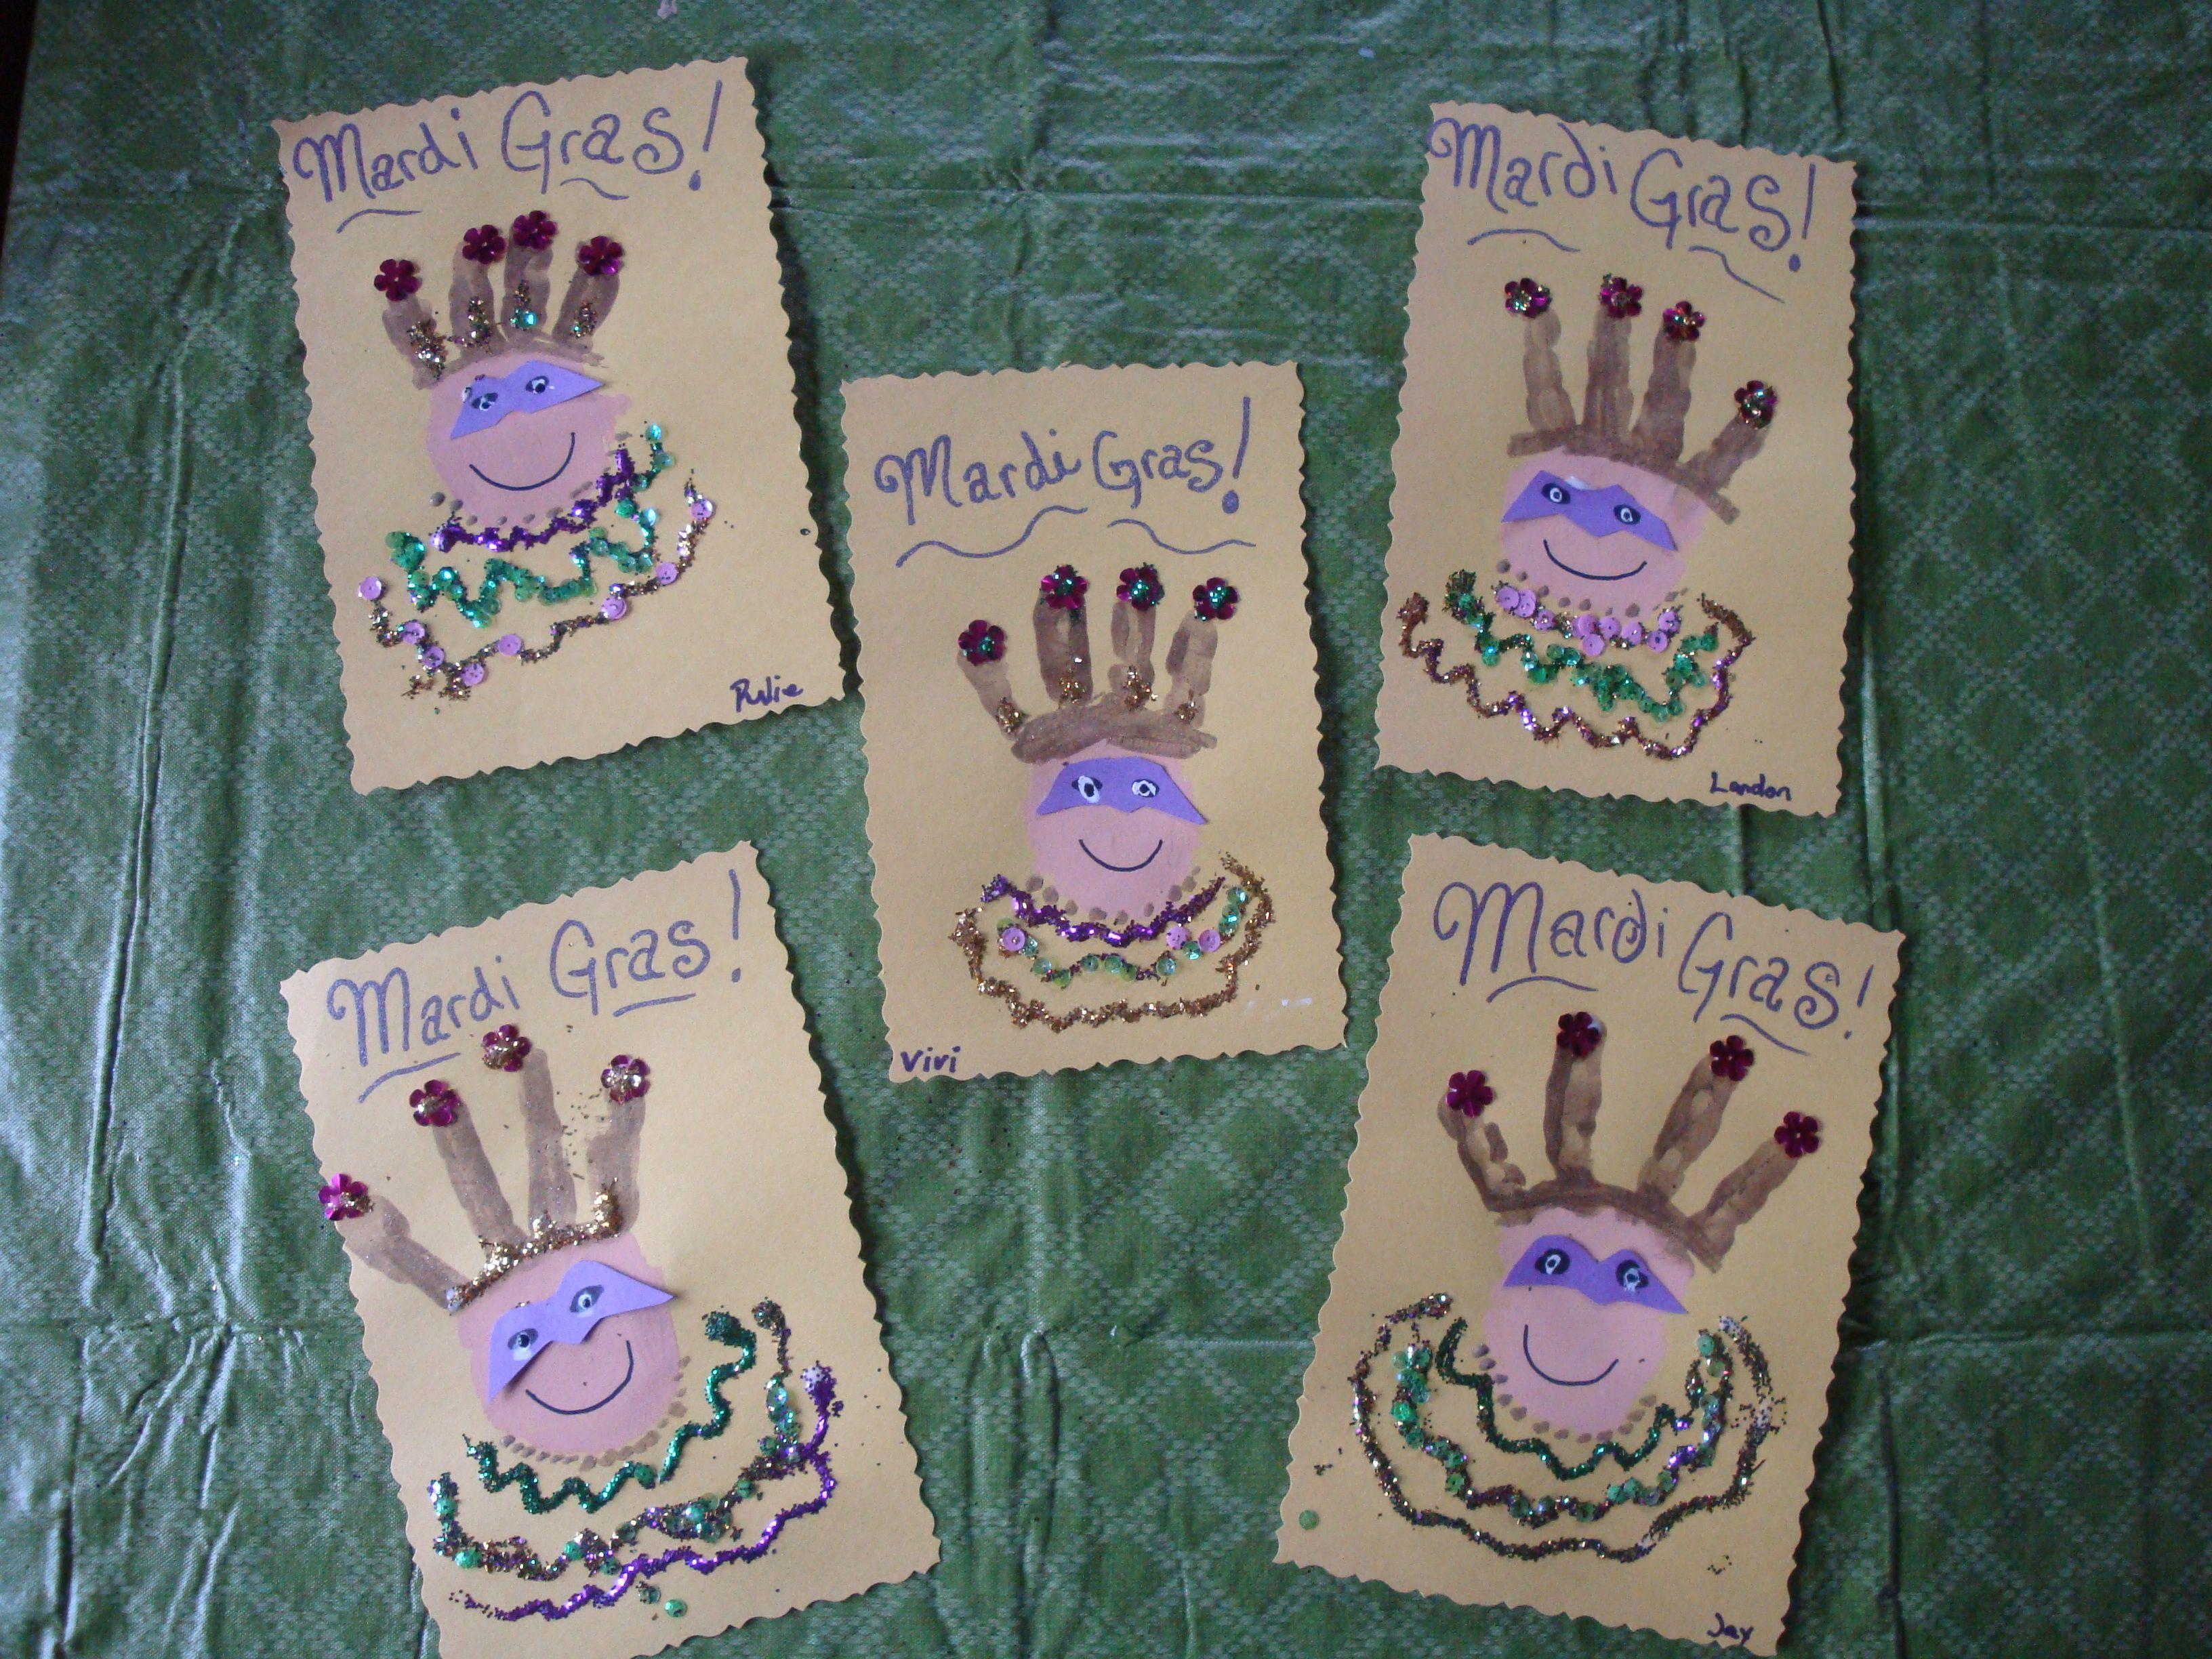 Mardi Gras King Of The Carnival Handprints Mardi Gras Kid Mardi Gras Activities Mardi Gras Carnival